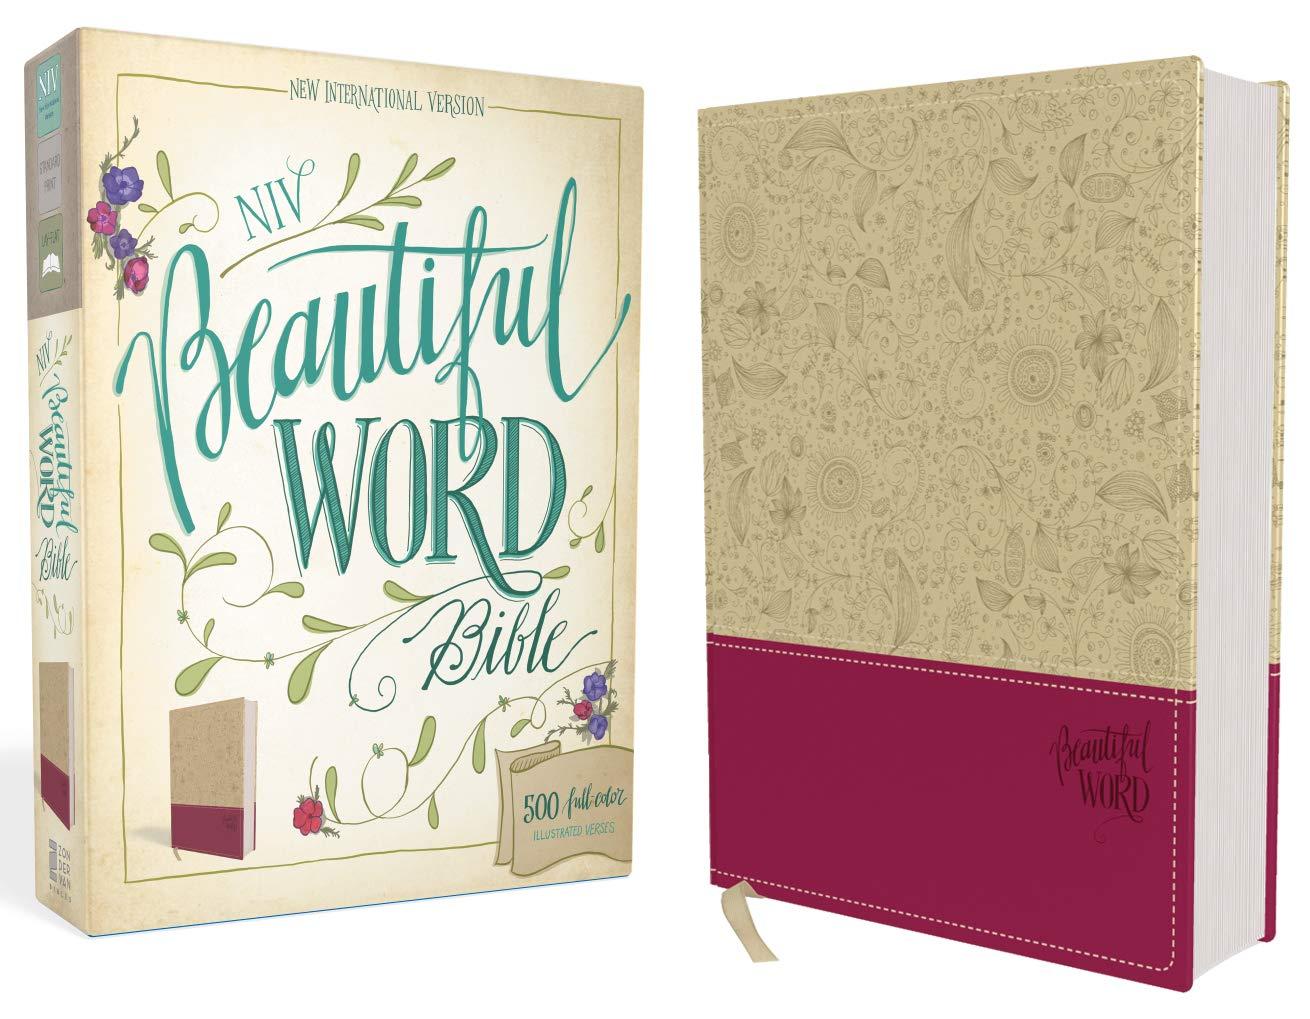 Niv Beautiful Word Bible Leathersoft Tan Pink 500 Full Color Illustrated Verses Zondervan 9780310444275 Amazon Com Books